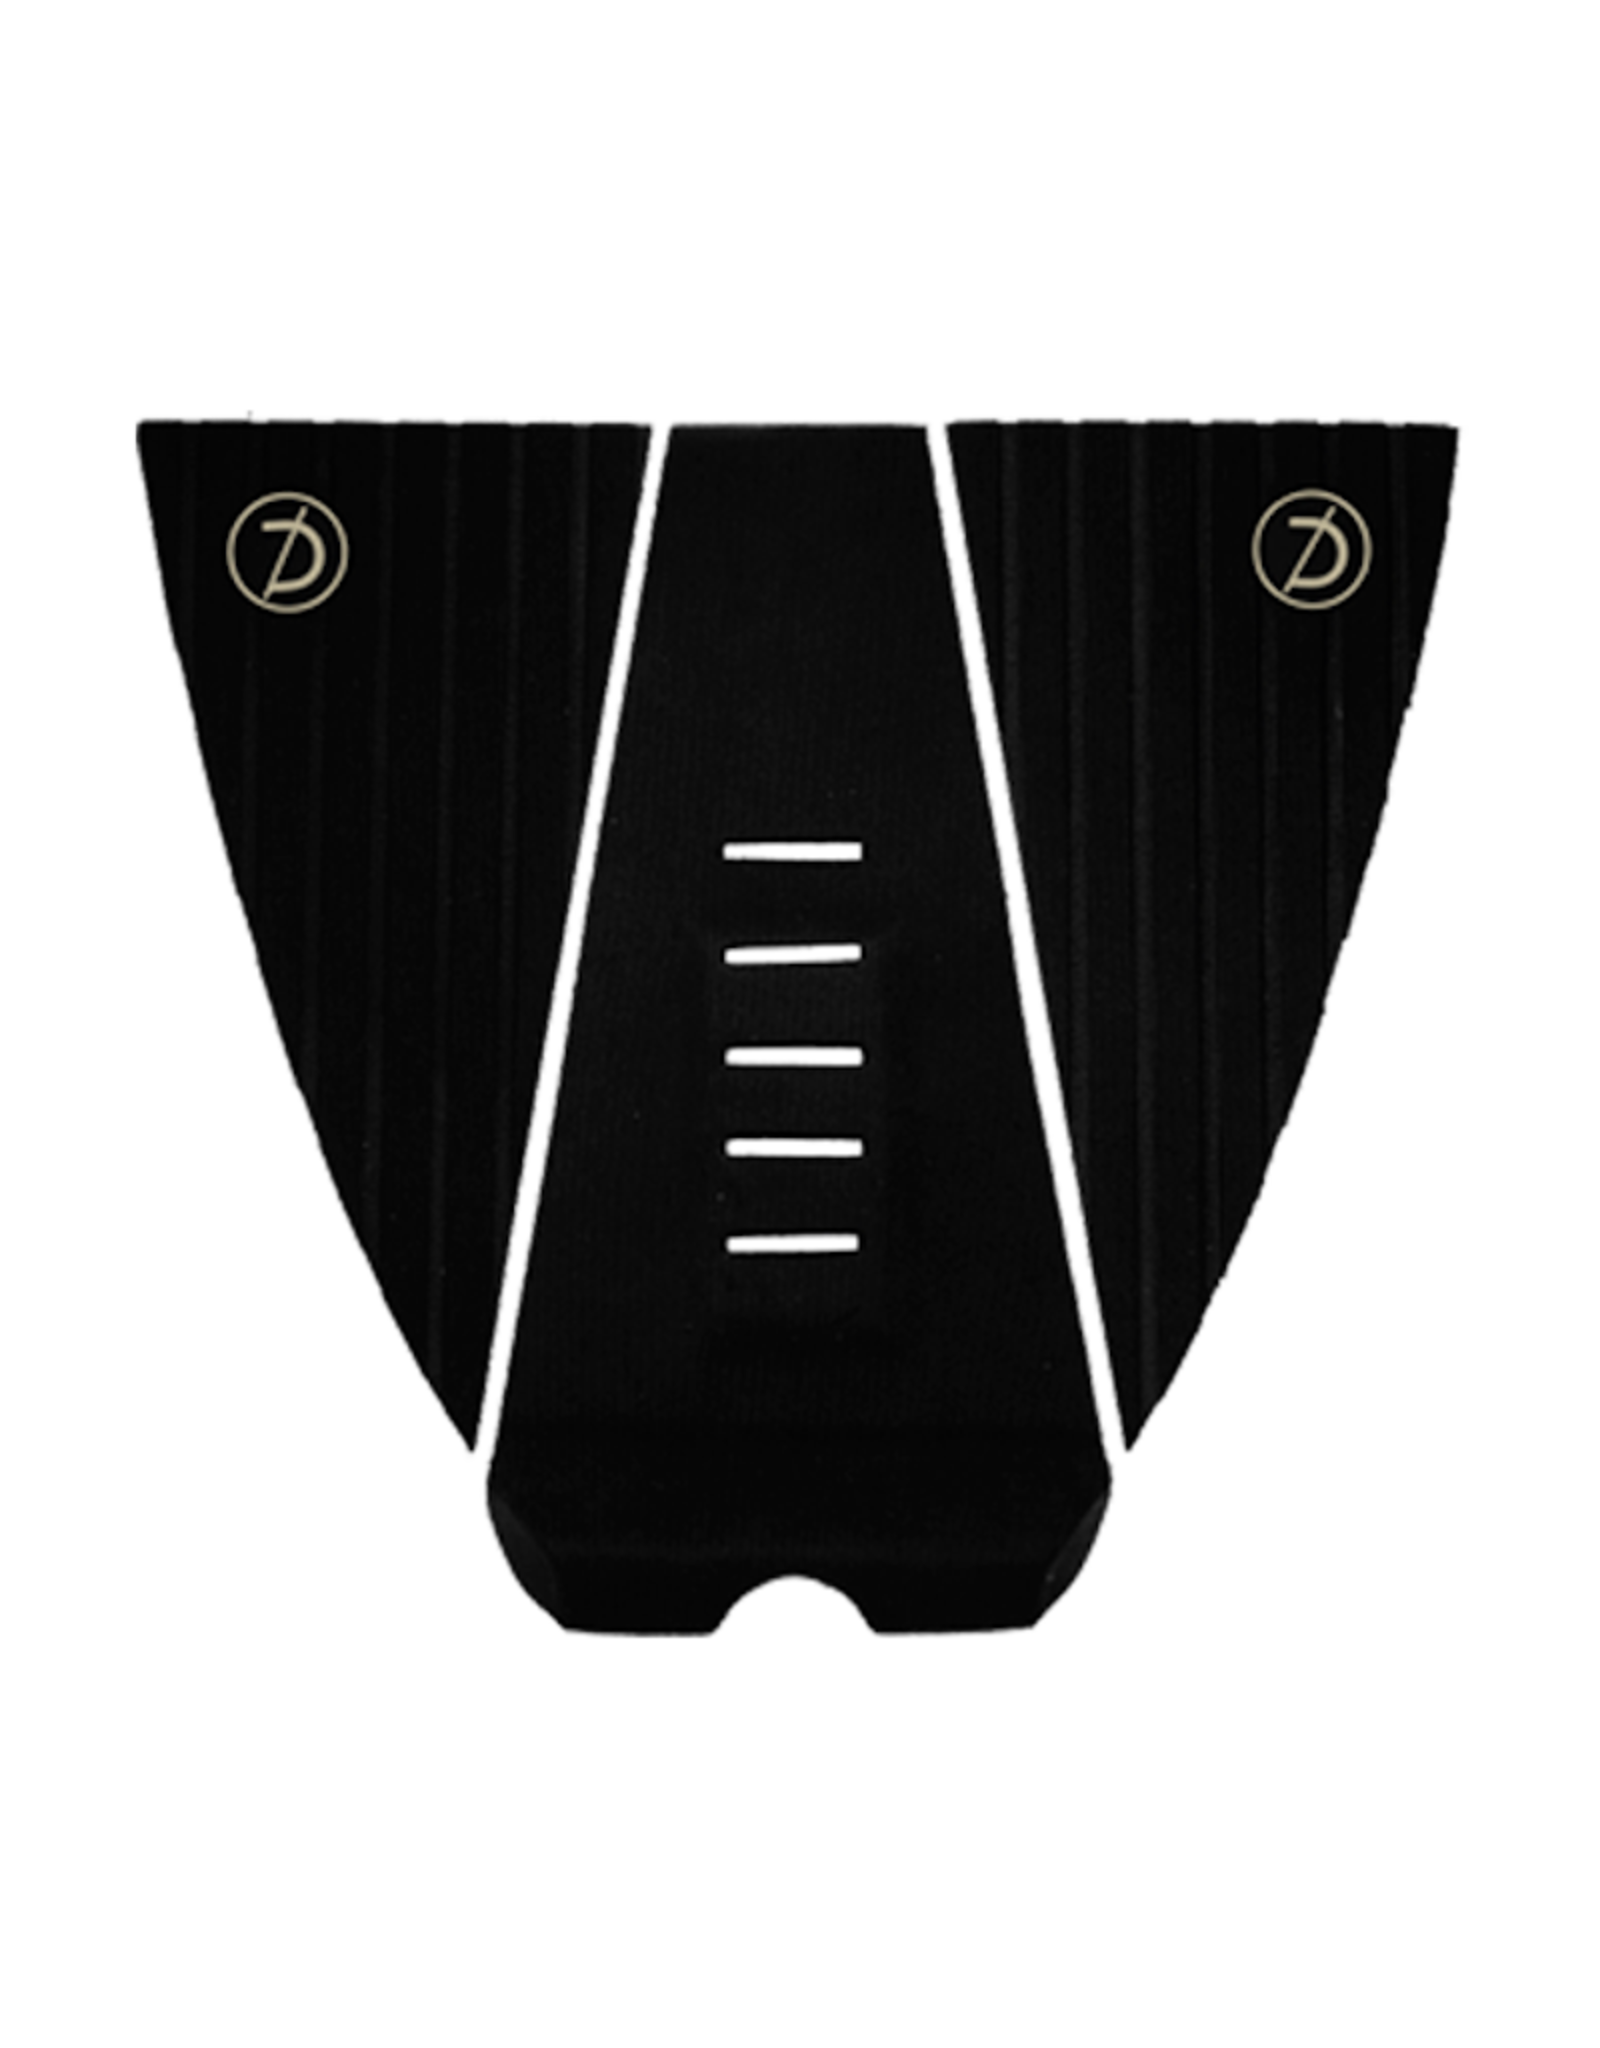 Deflow Deflow 3 Piece Traction Pad Black